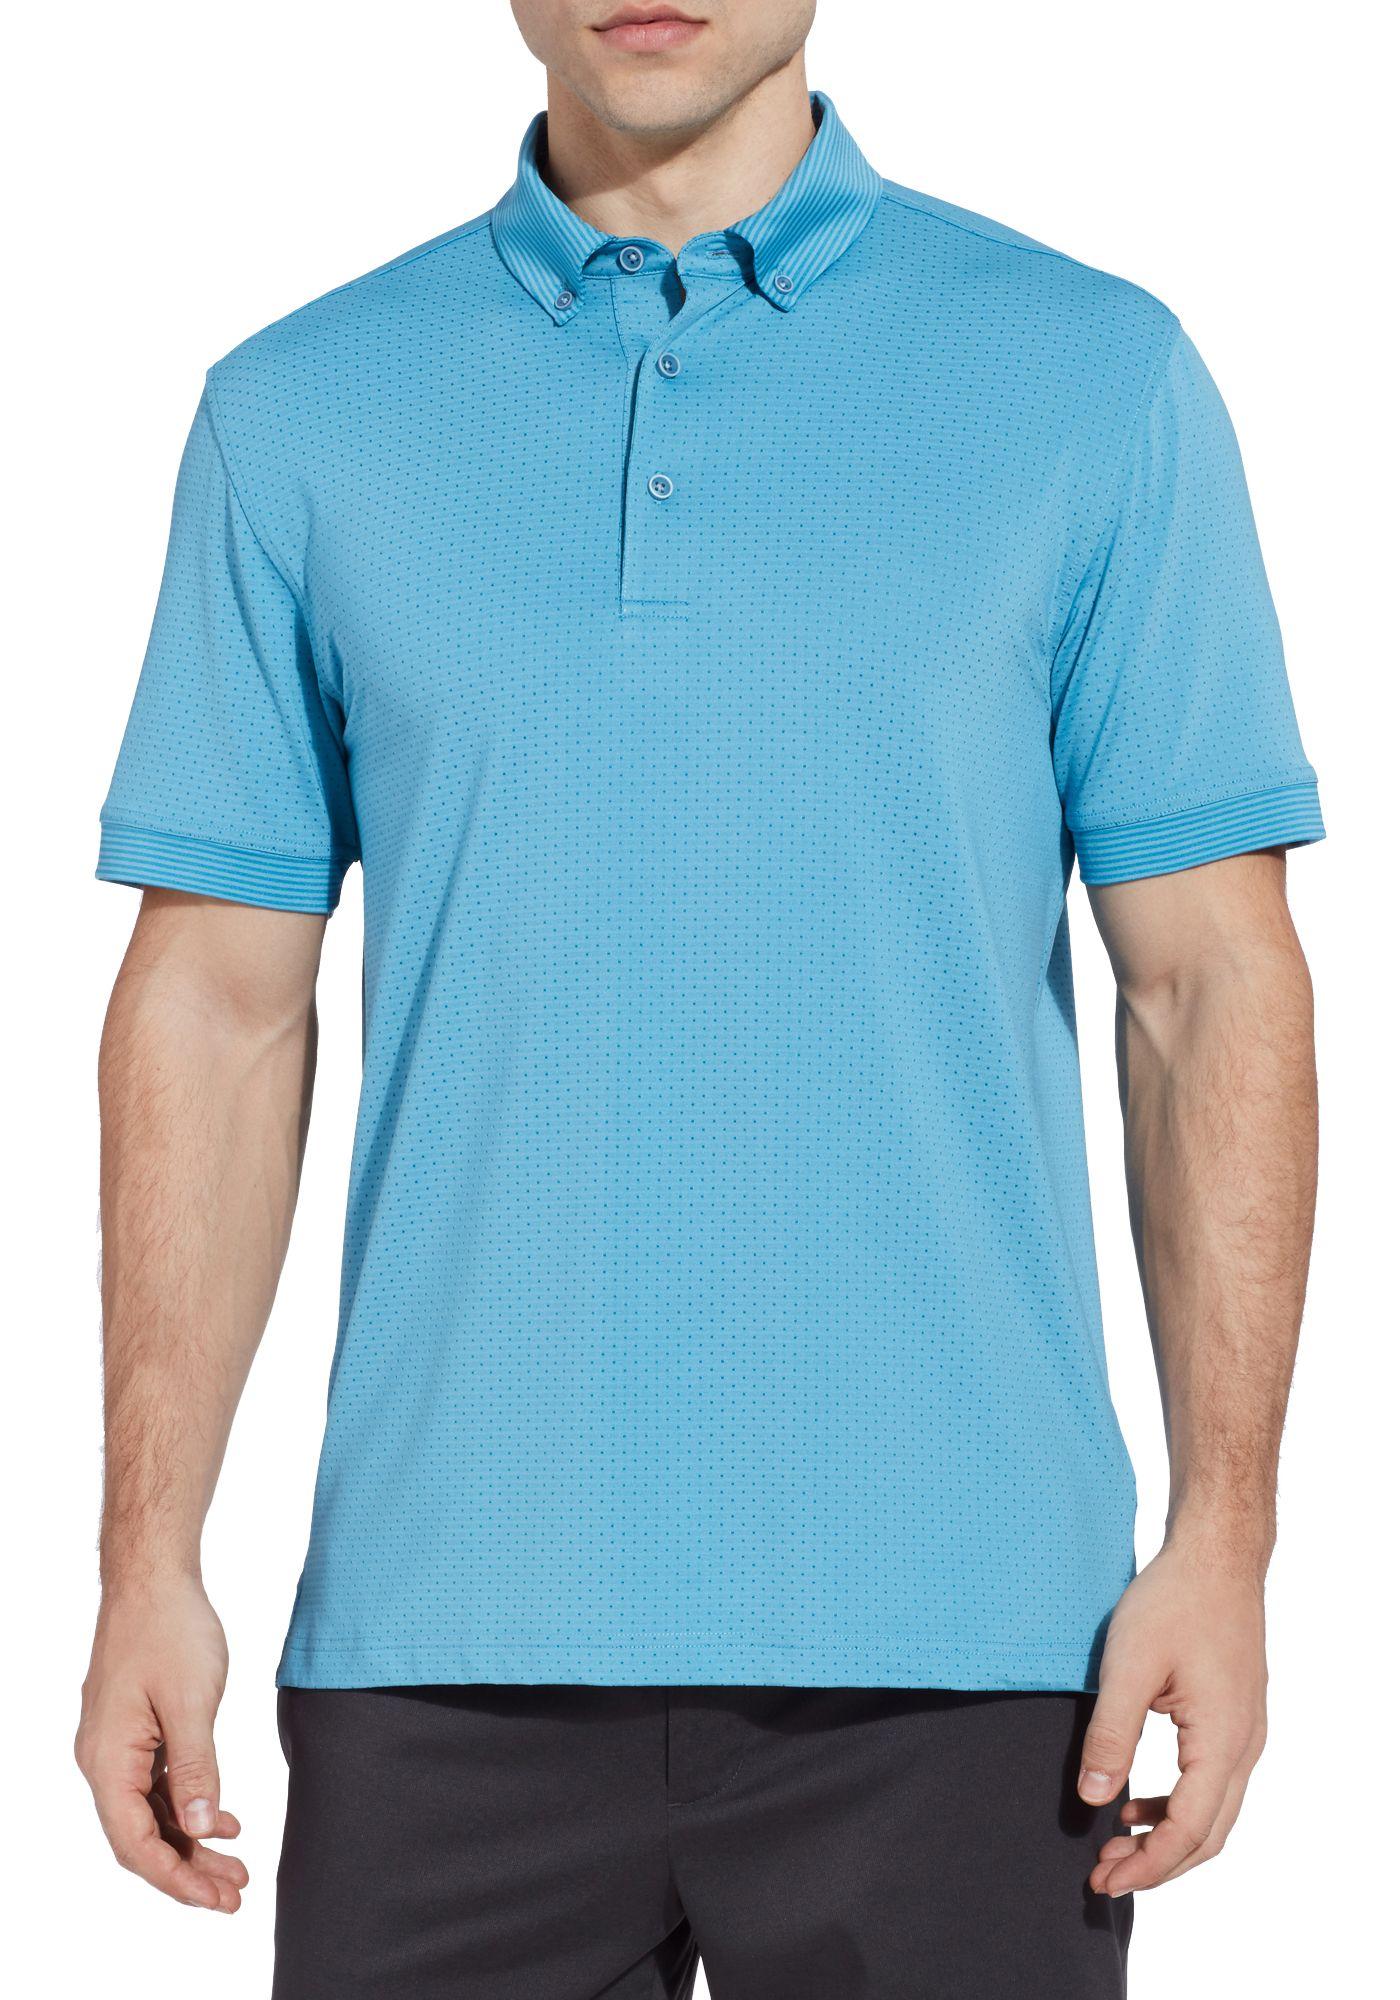 Walter Hagen Men's Polka Dot Stripe Lifestyle Golf Polo